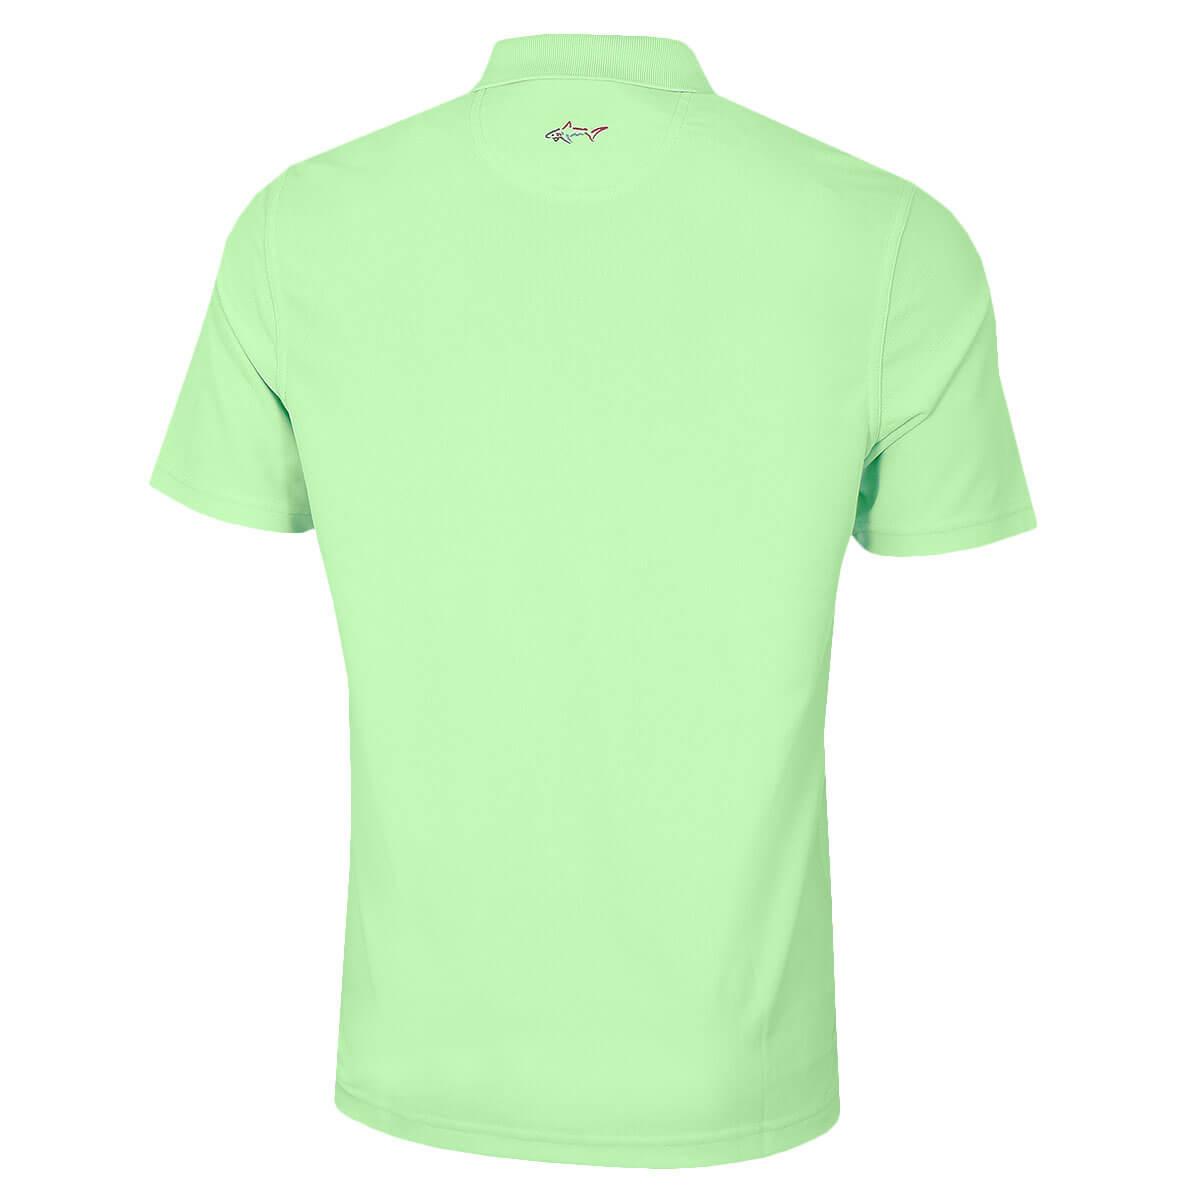 Greg-Norman-Mens-KX04-Performance-Micro-Pique-Golf-Polo-Shirt-28-OFF-RRP thumbnail 40